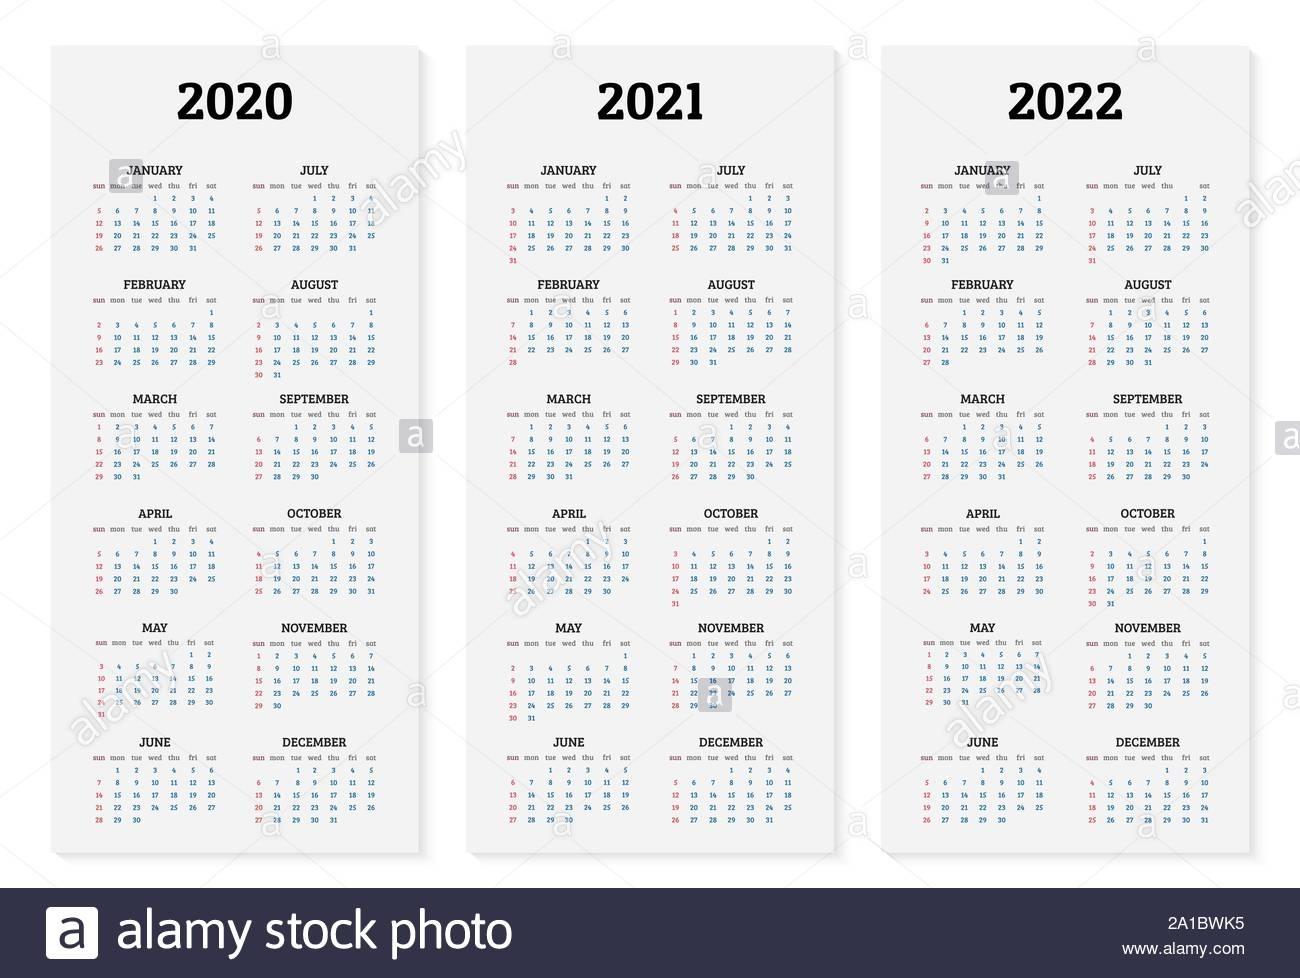 Calendario 2021 2022 Imágenes Recortadas De Stock - Alamy